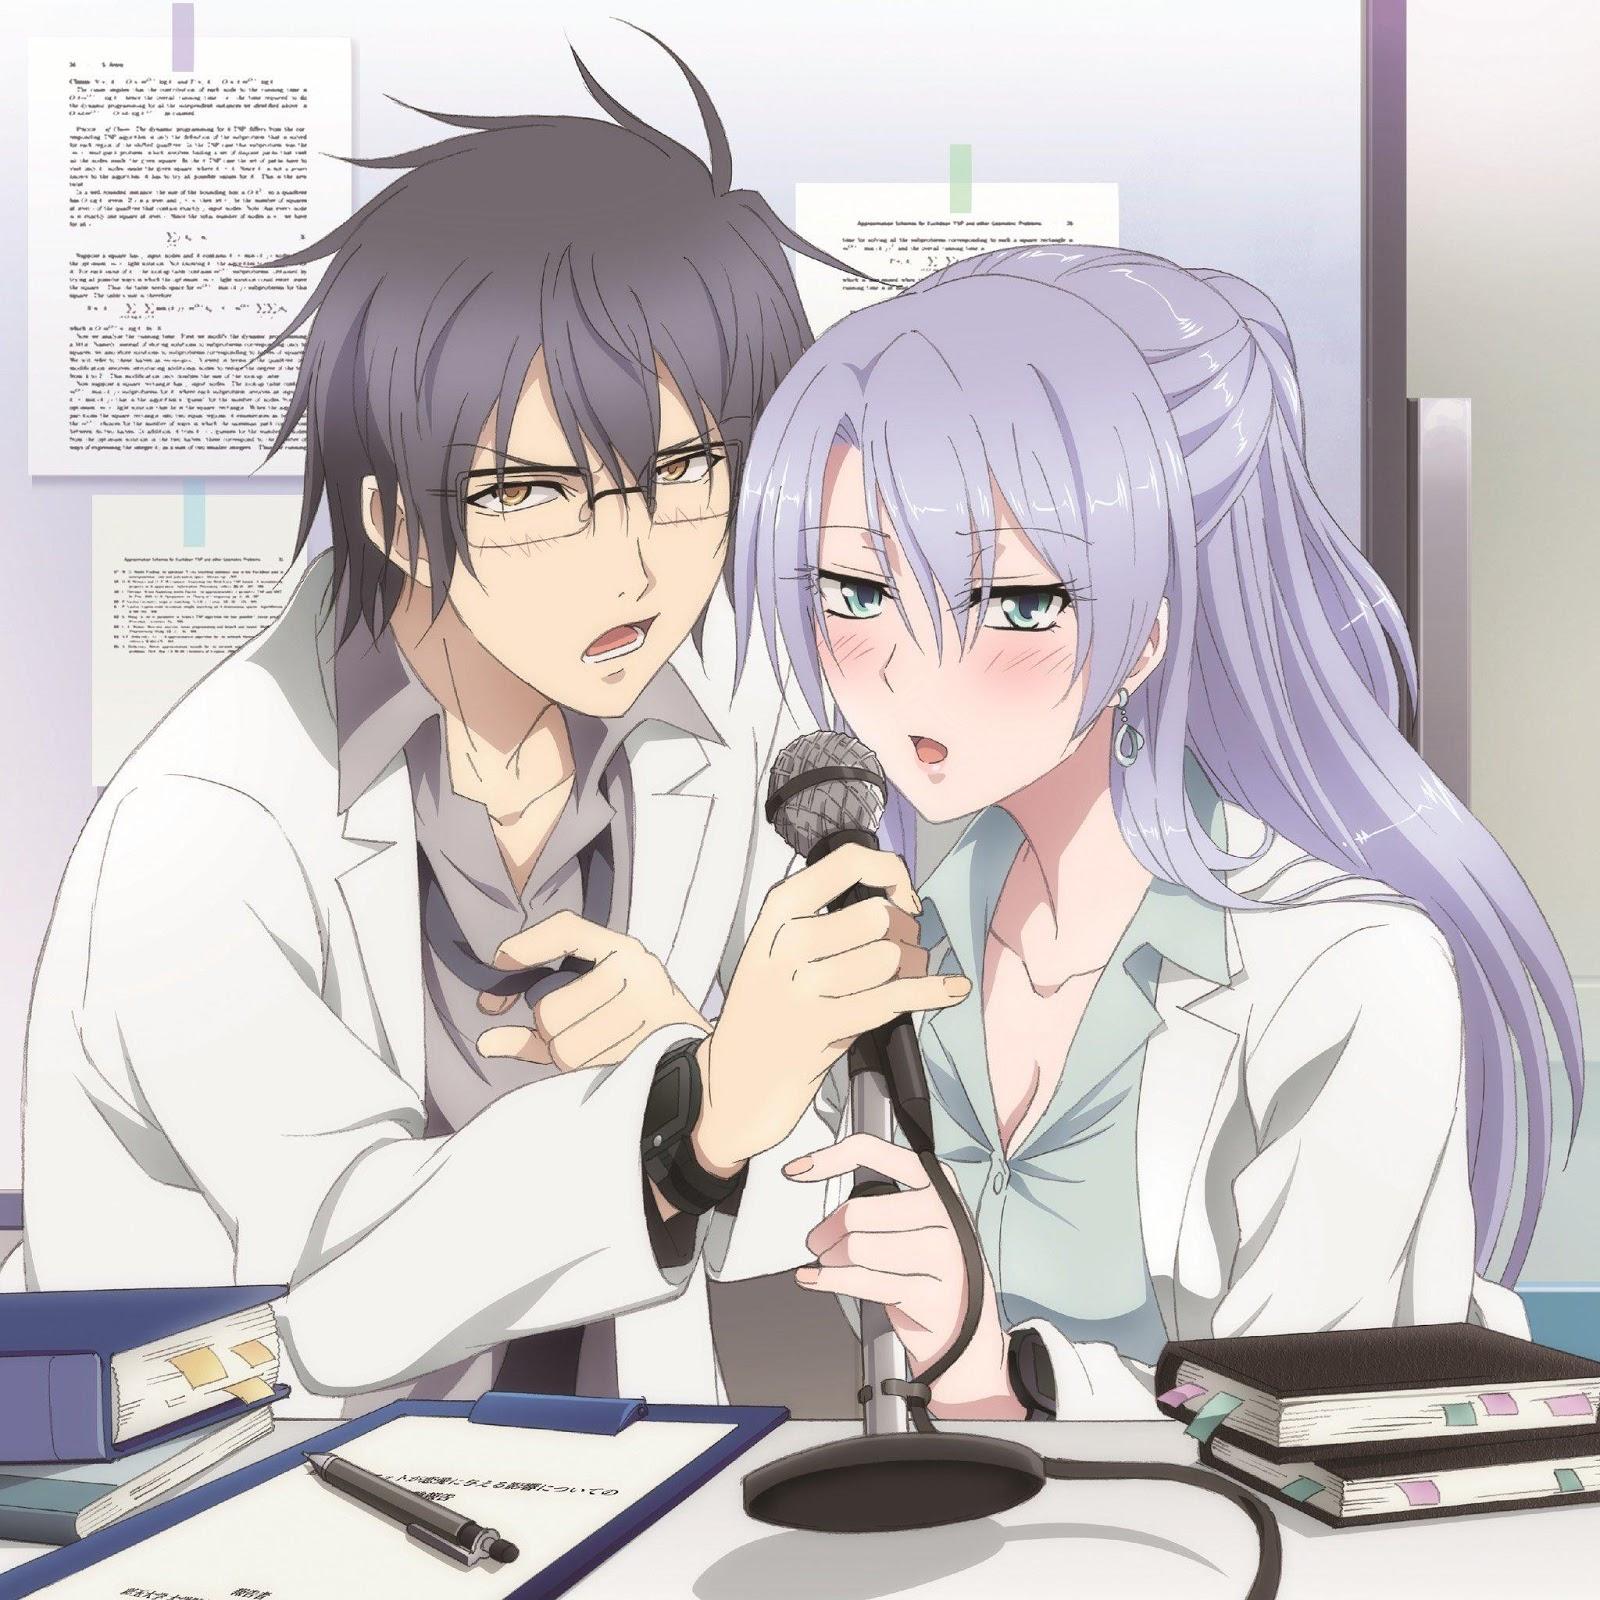 [ED] Turing Love – Akari Nanawo feat. Sou